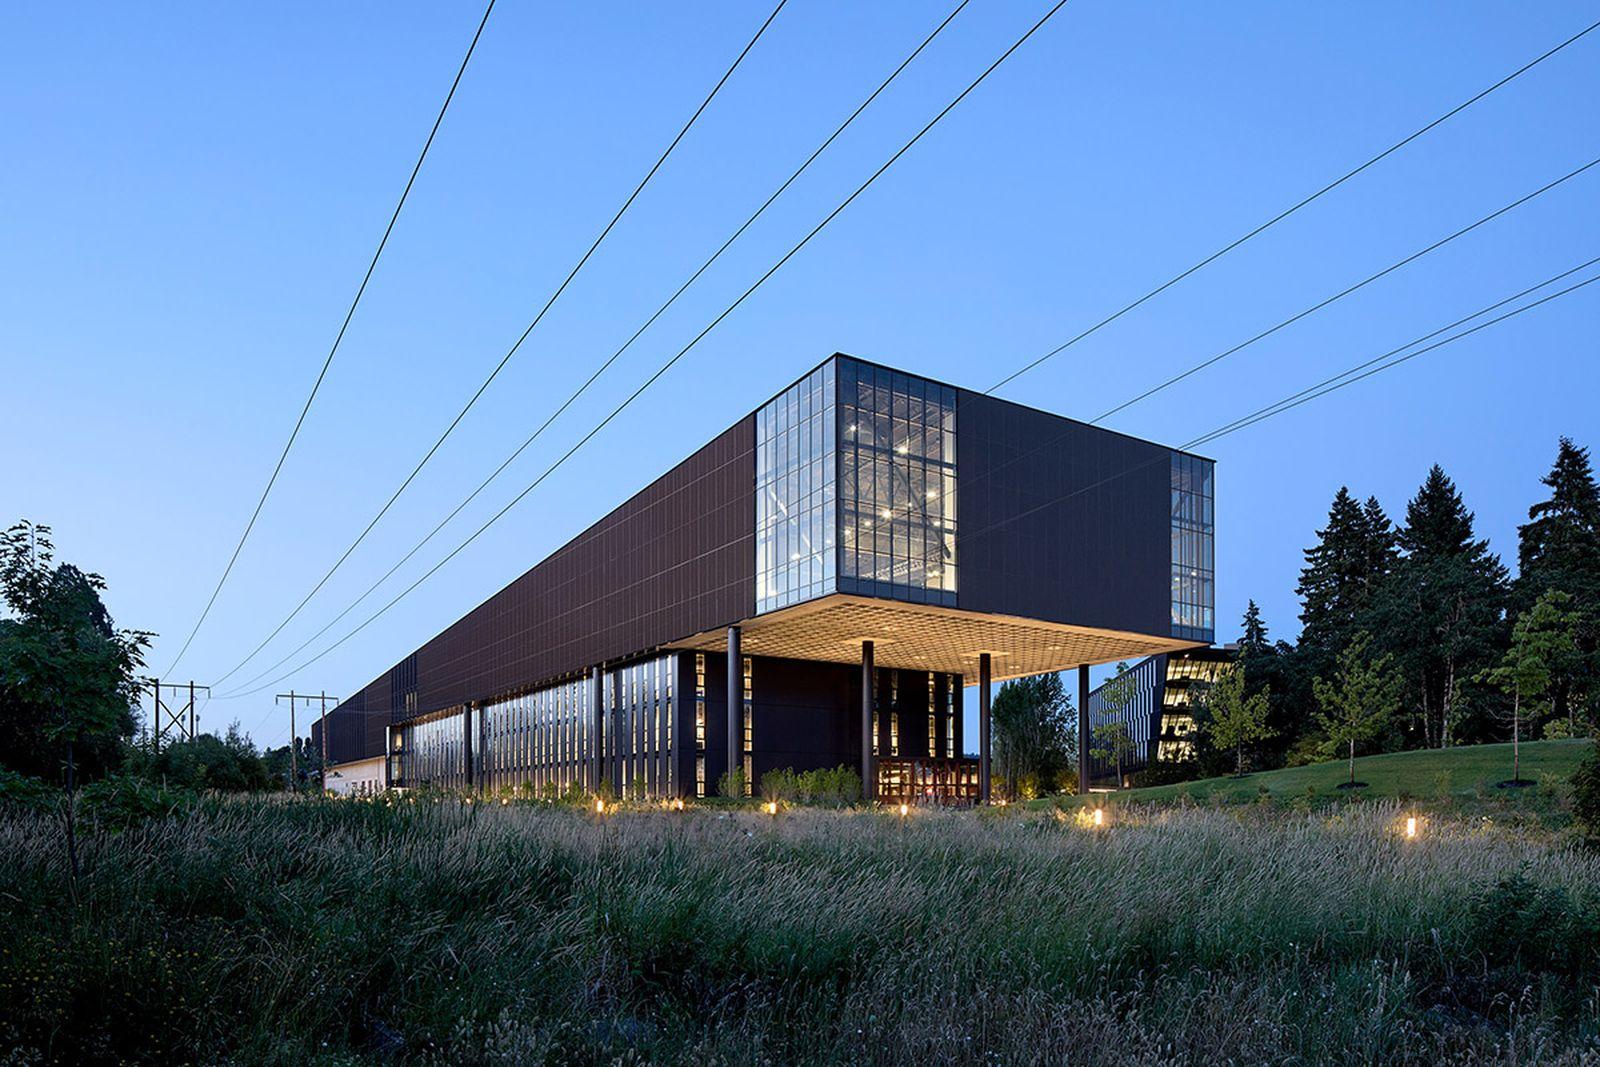 nike-lebron-james-innovation-center- (11)